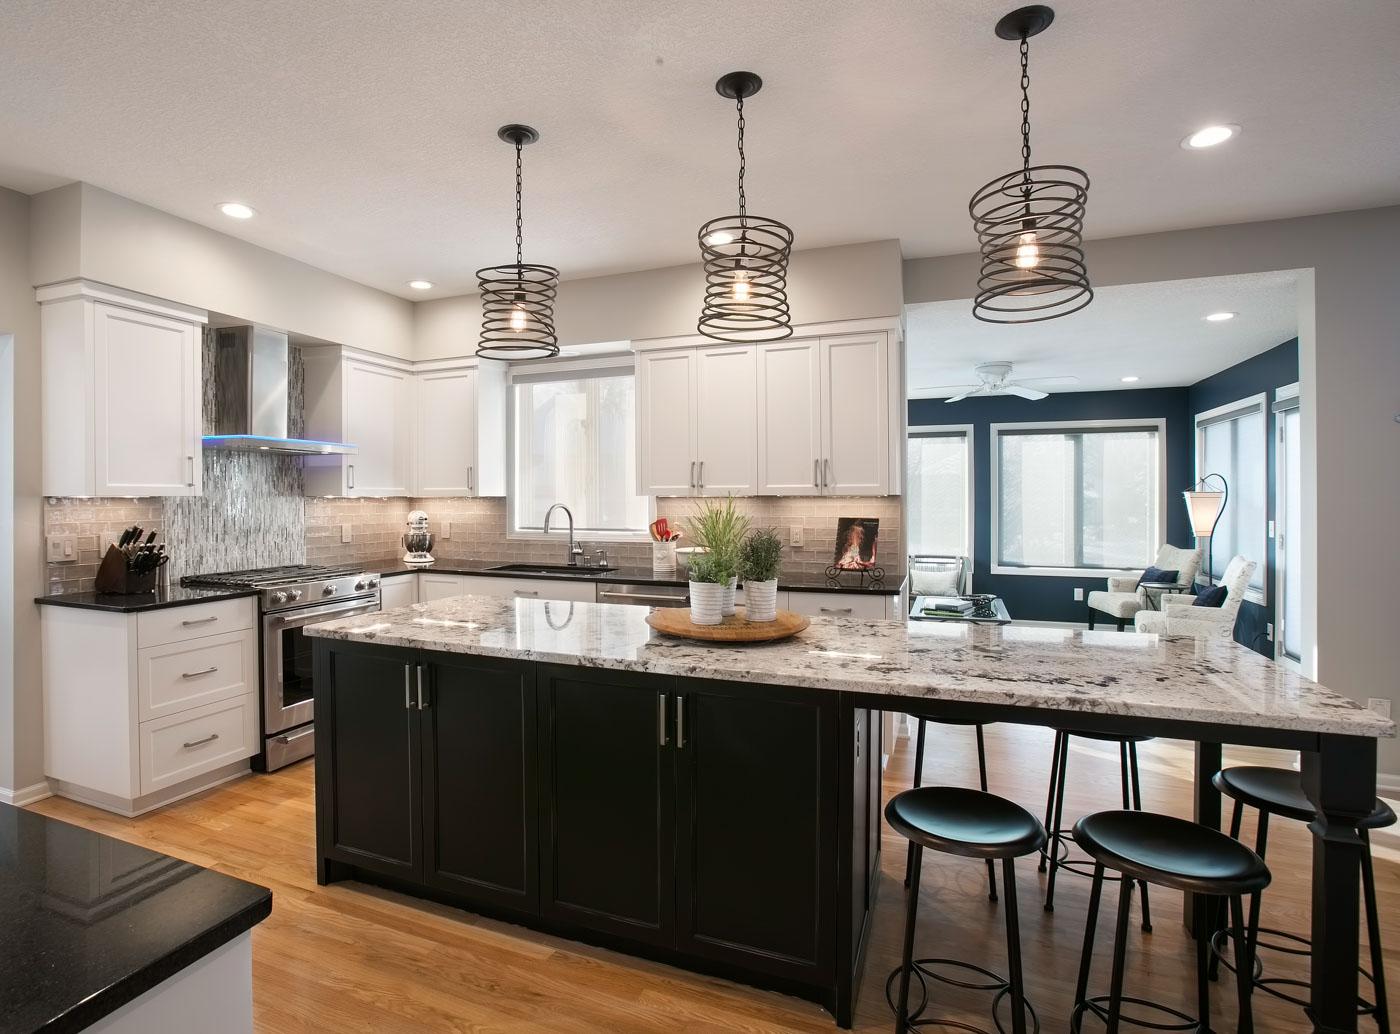 kitchen remodeling gallery portfolio james barton designbuild minneapolis kitchen designer - Minneapolis Kitchen Remodeling